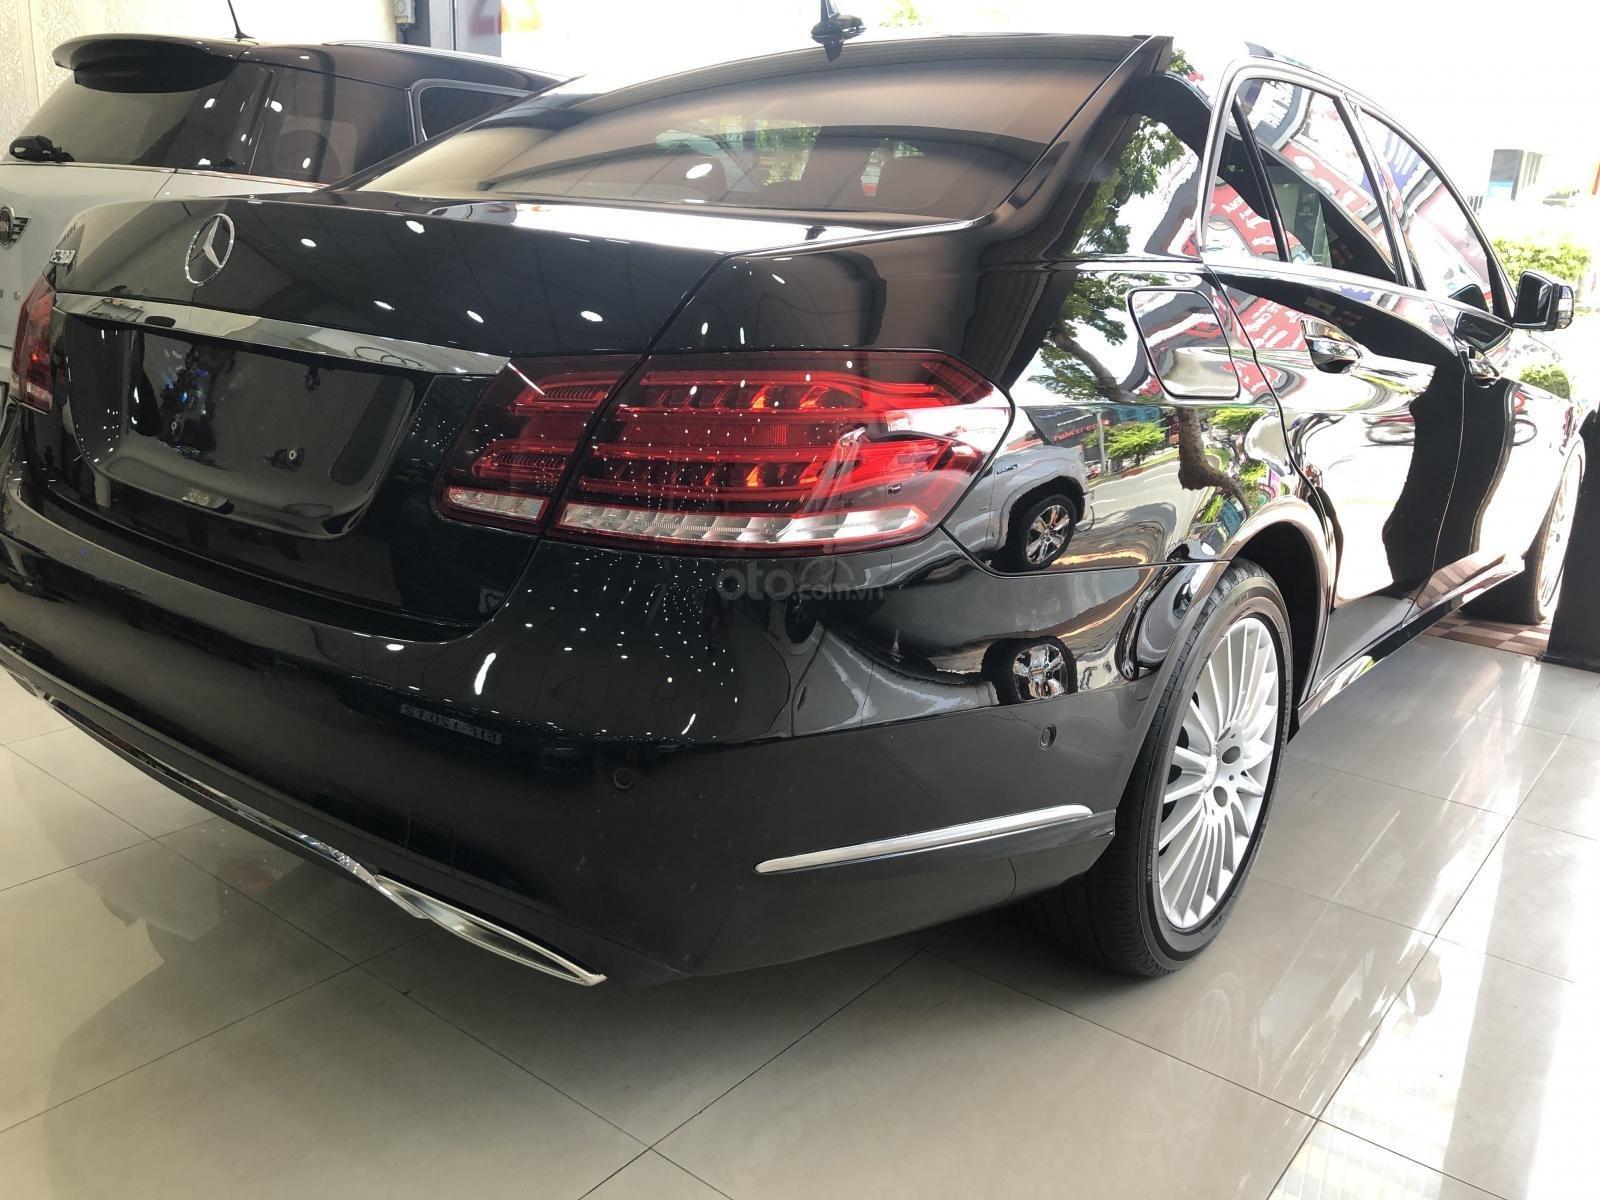 Cần bán xe Mercedes-Benz E200 sản xuất 2015, ĐKLĐ 2016 (4)